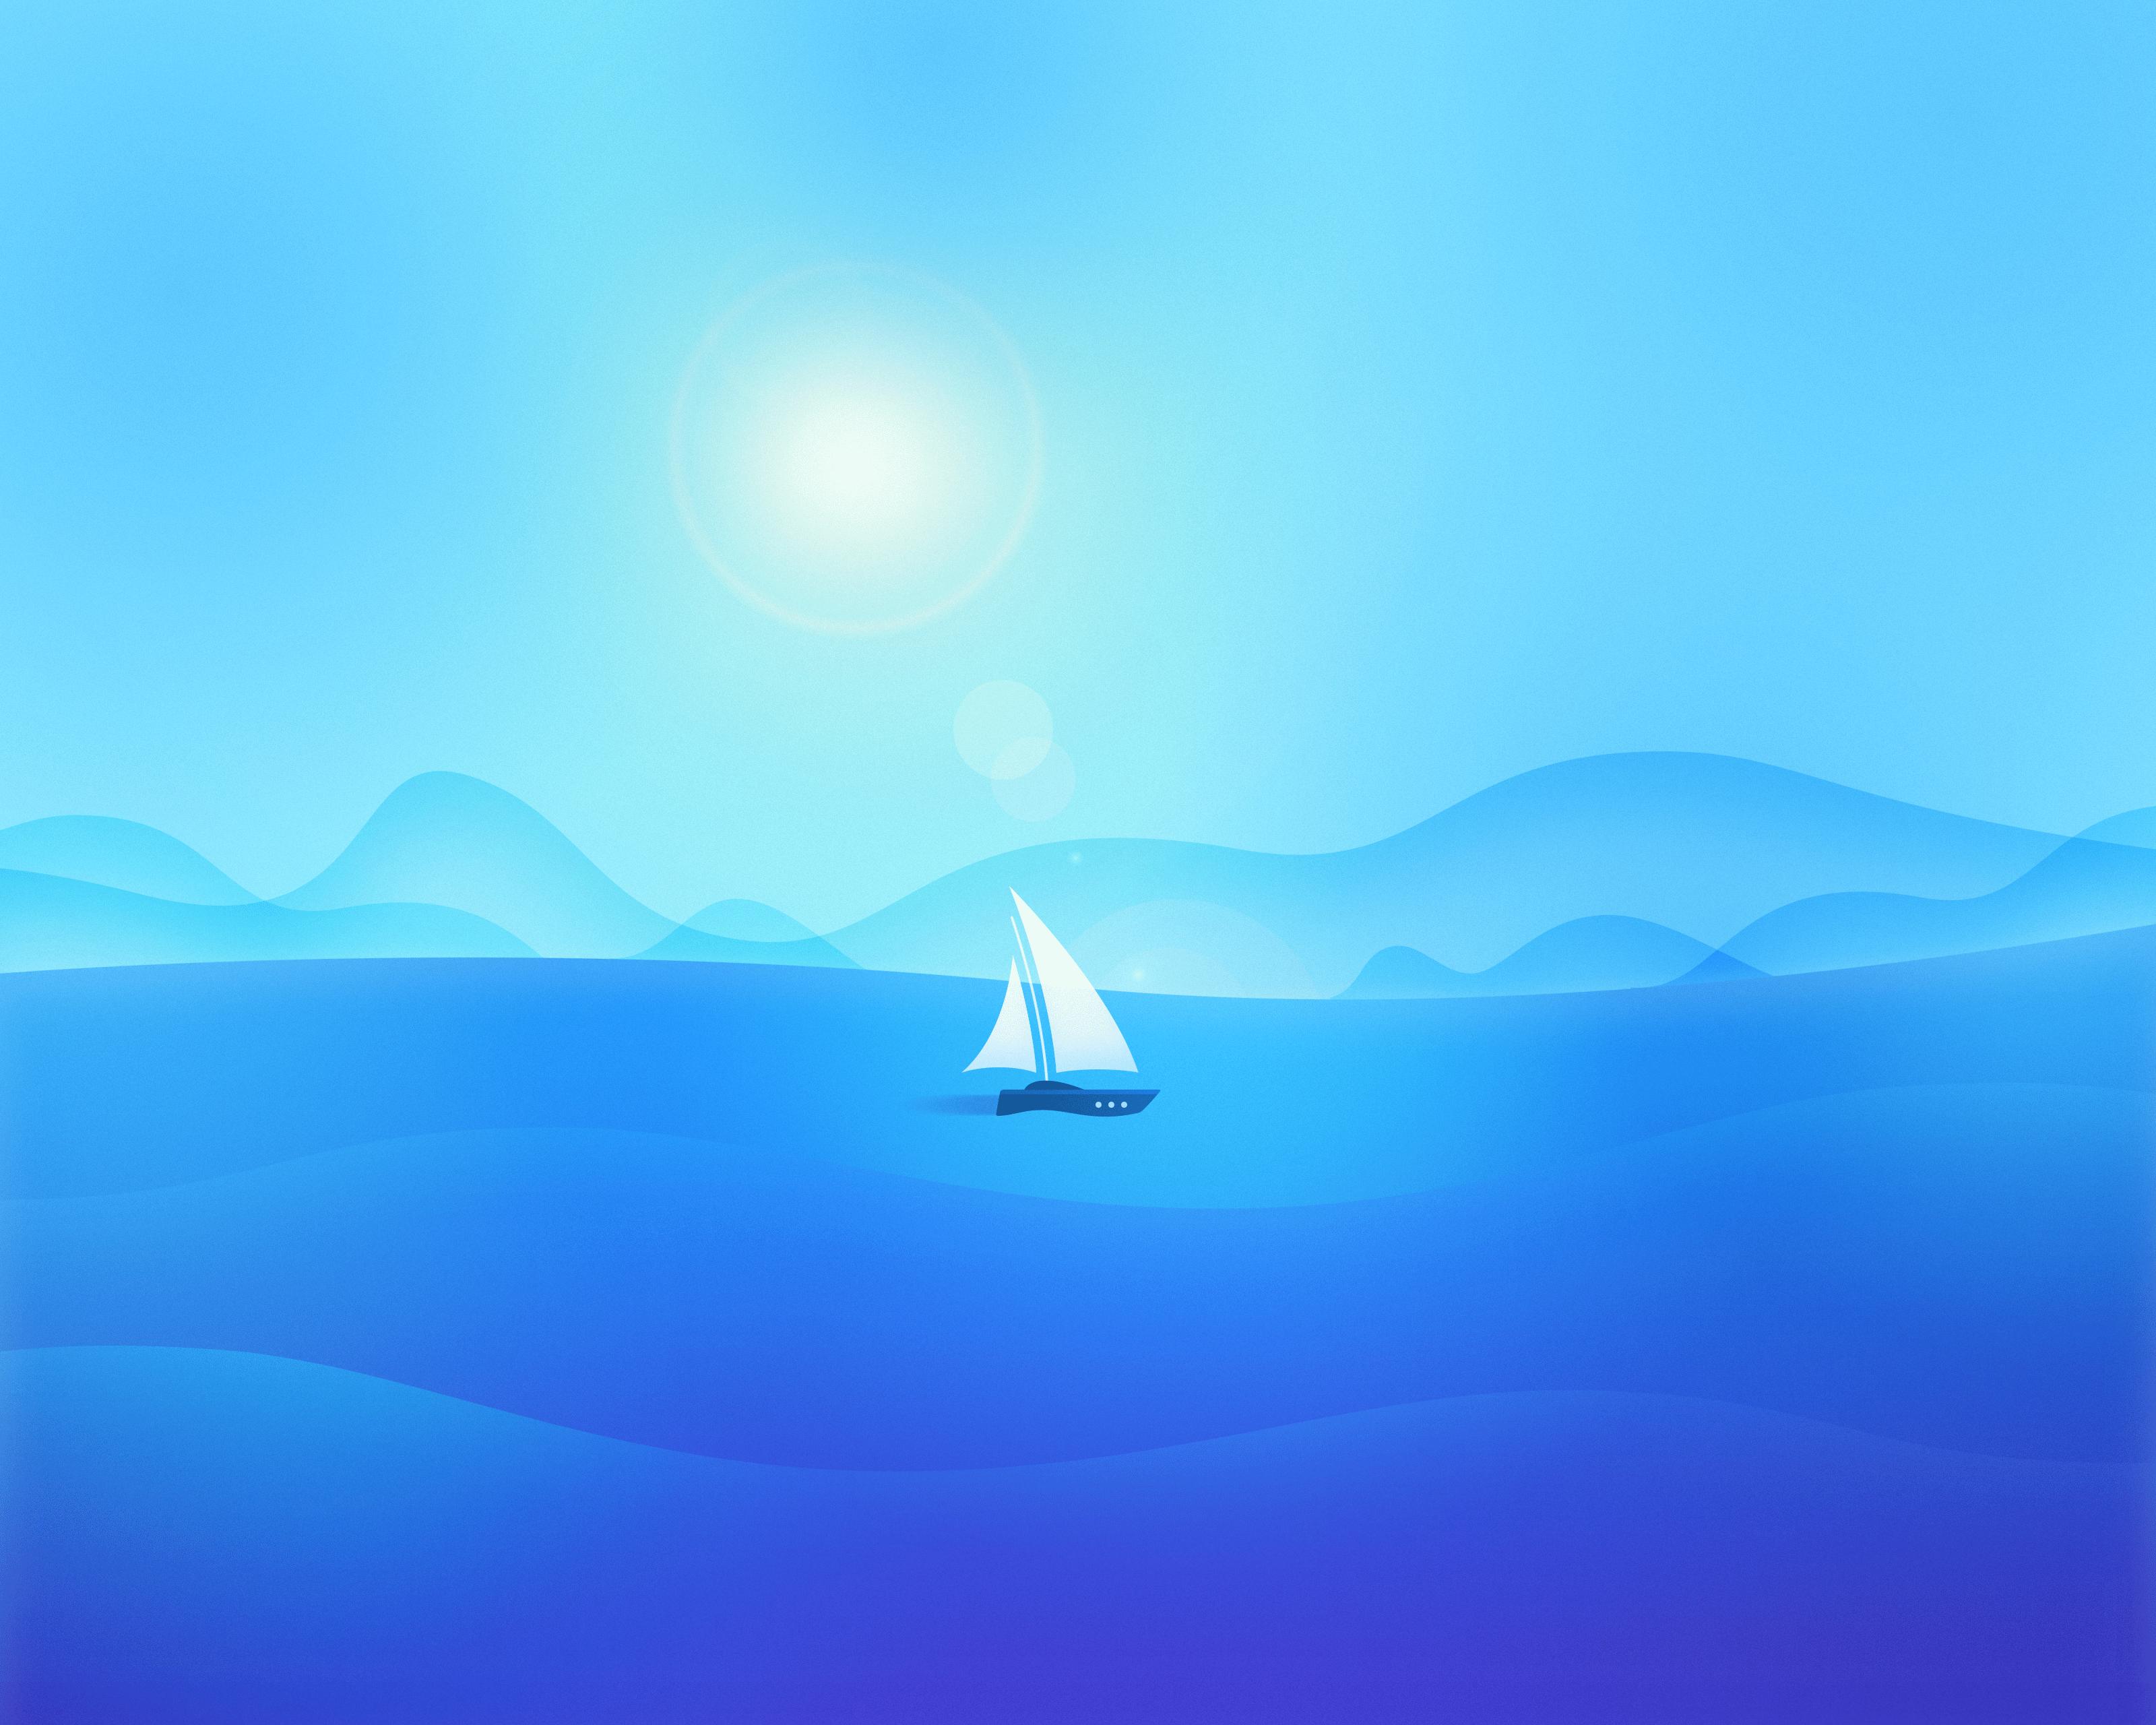 Wallpaper Sea Sailboats Material Minimal Flatdesign